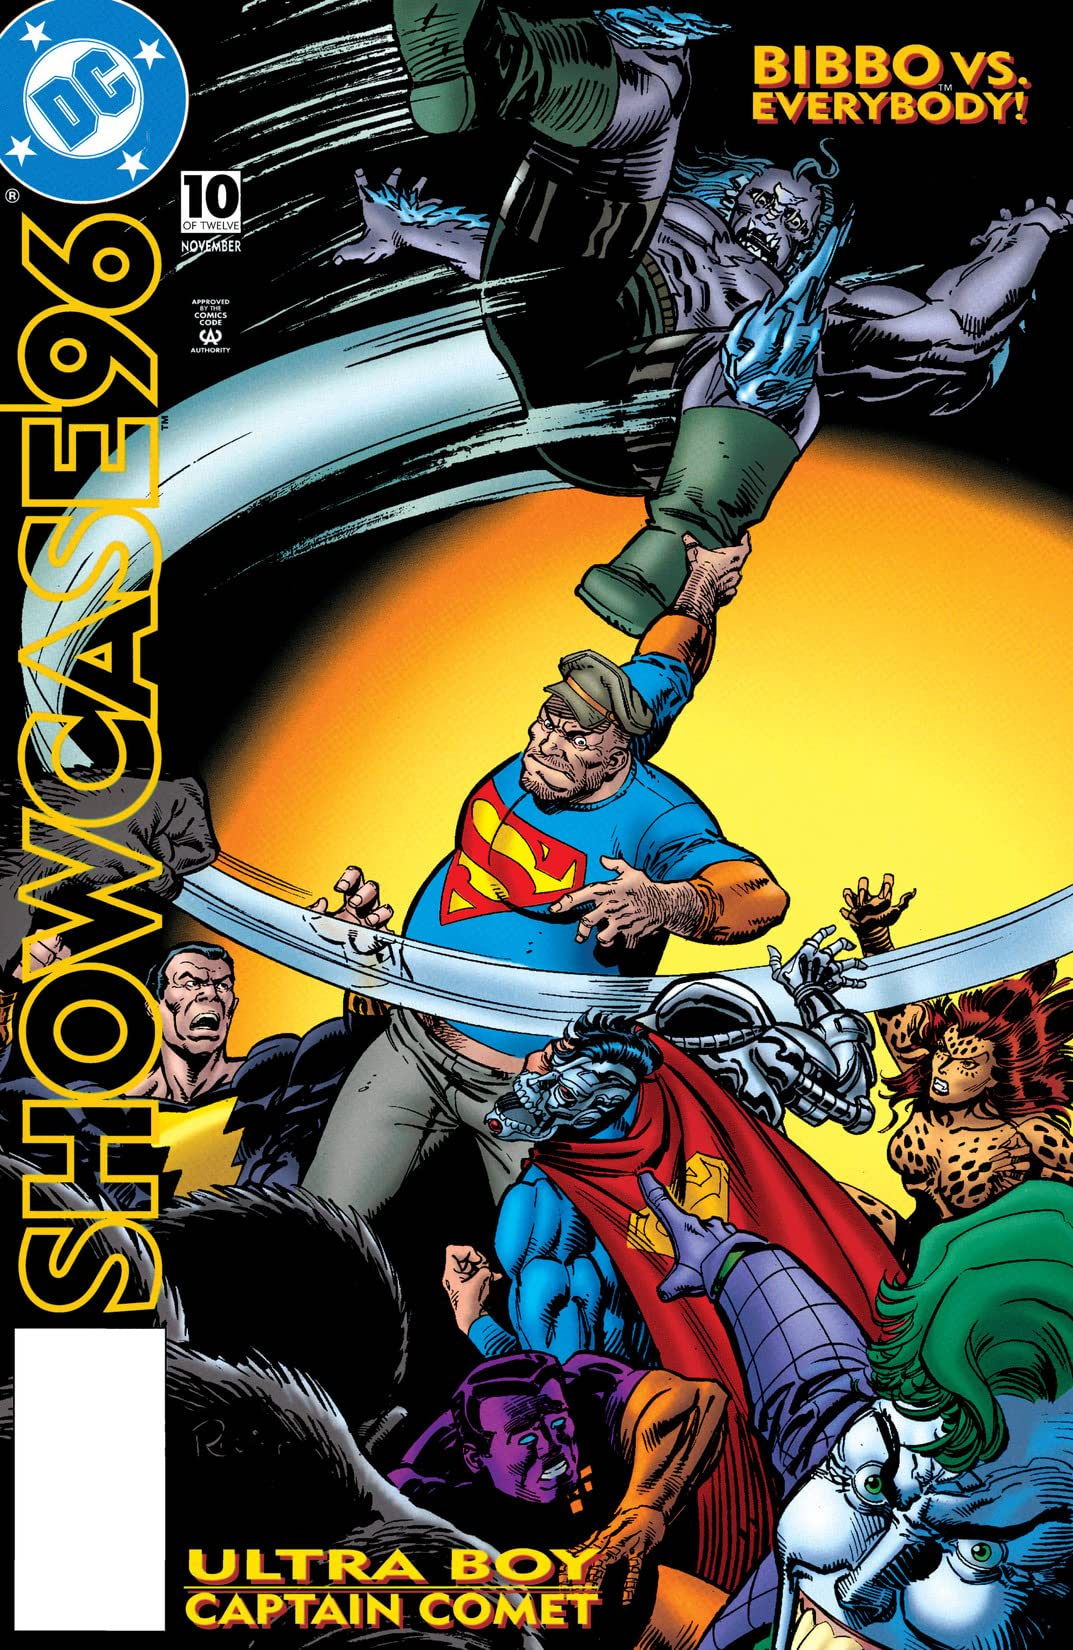 Showcase '96 #10